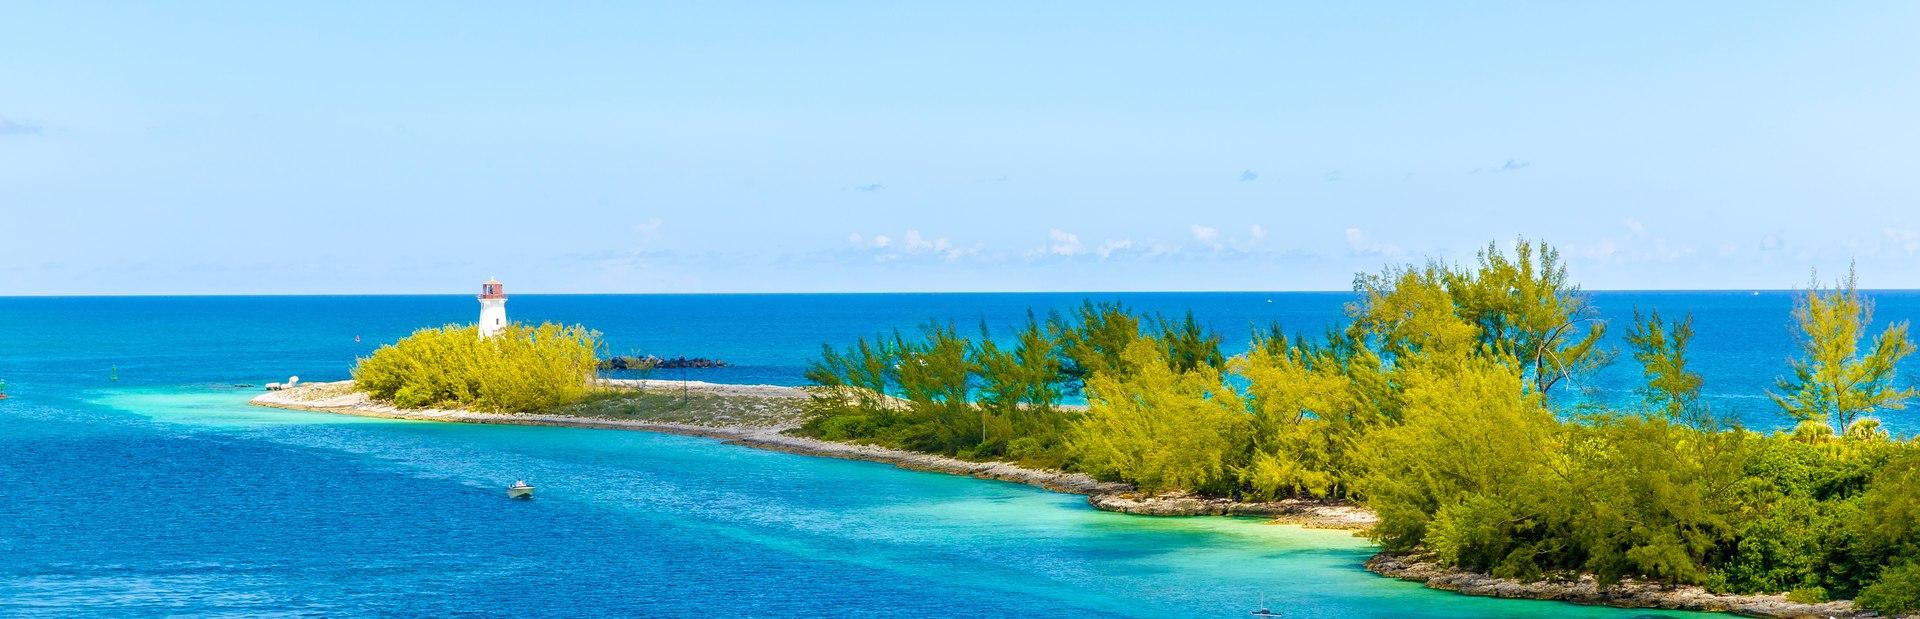 Bahamas climate photo